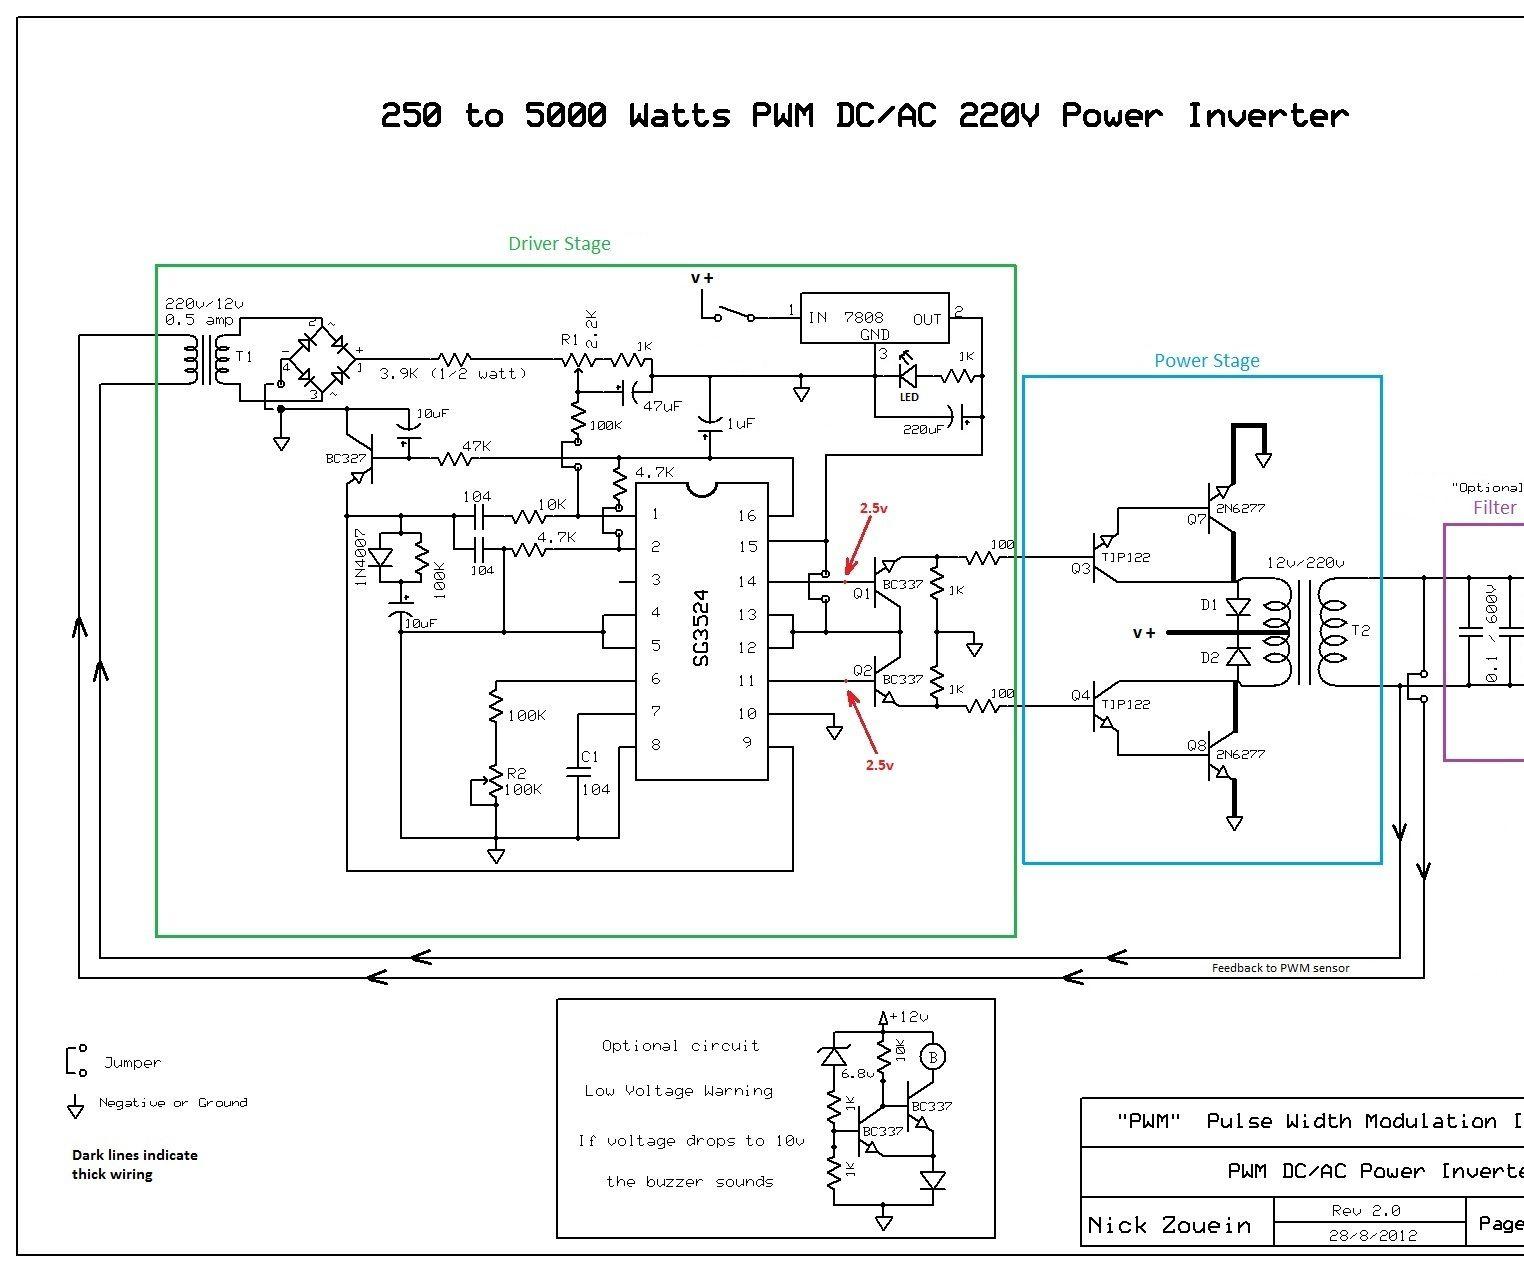 120v schematic wiring wiring diagrams konsult12v to 120v transformer wiring diagram free picture wiring diagram 120v [ 1524 x 1270 Pixel ]